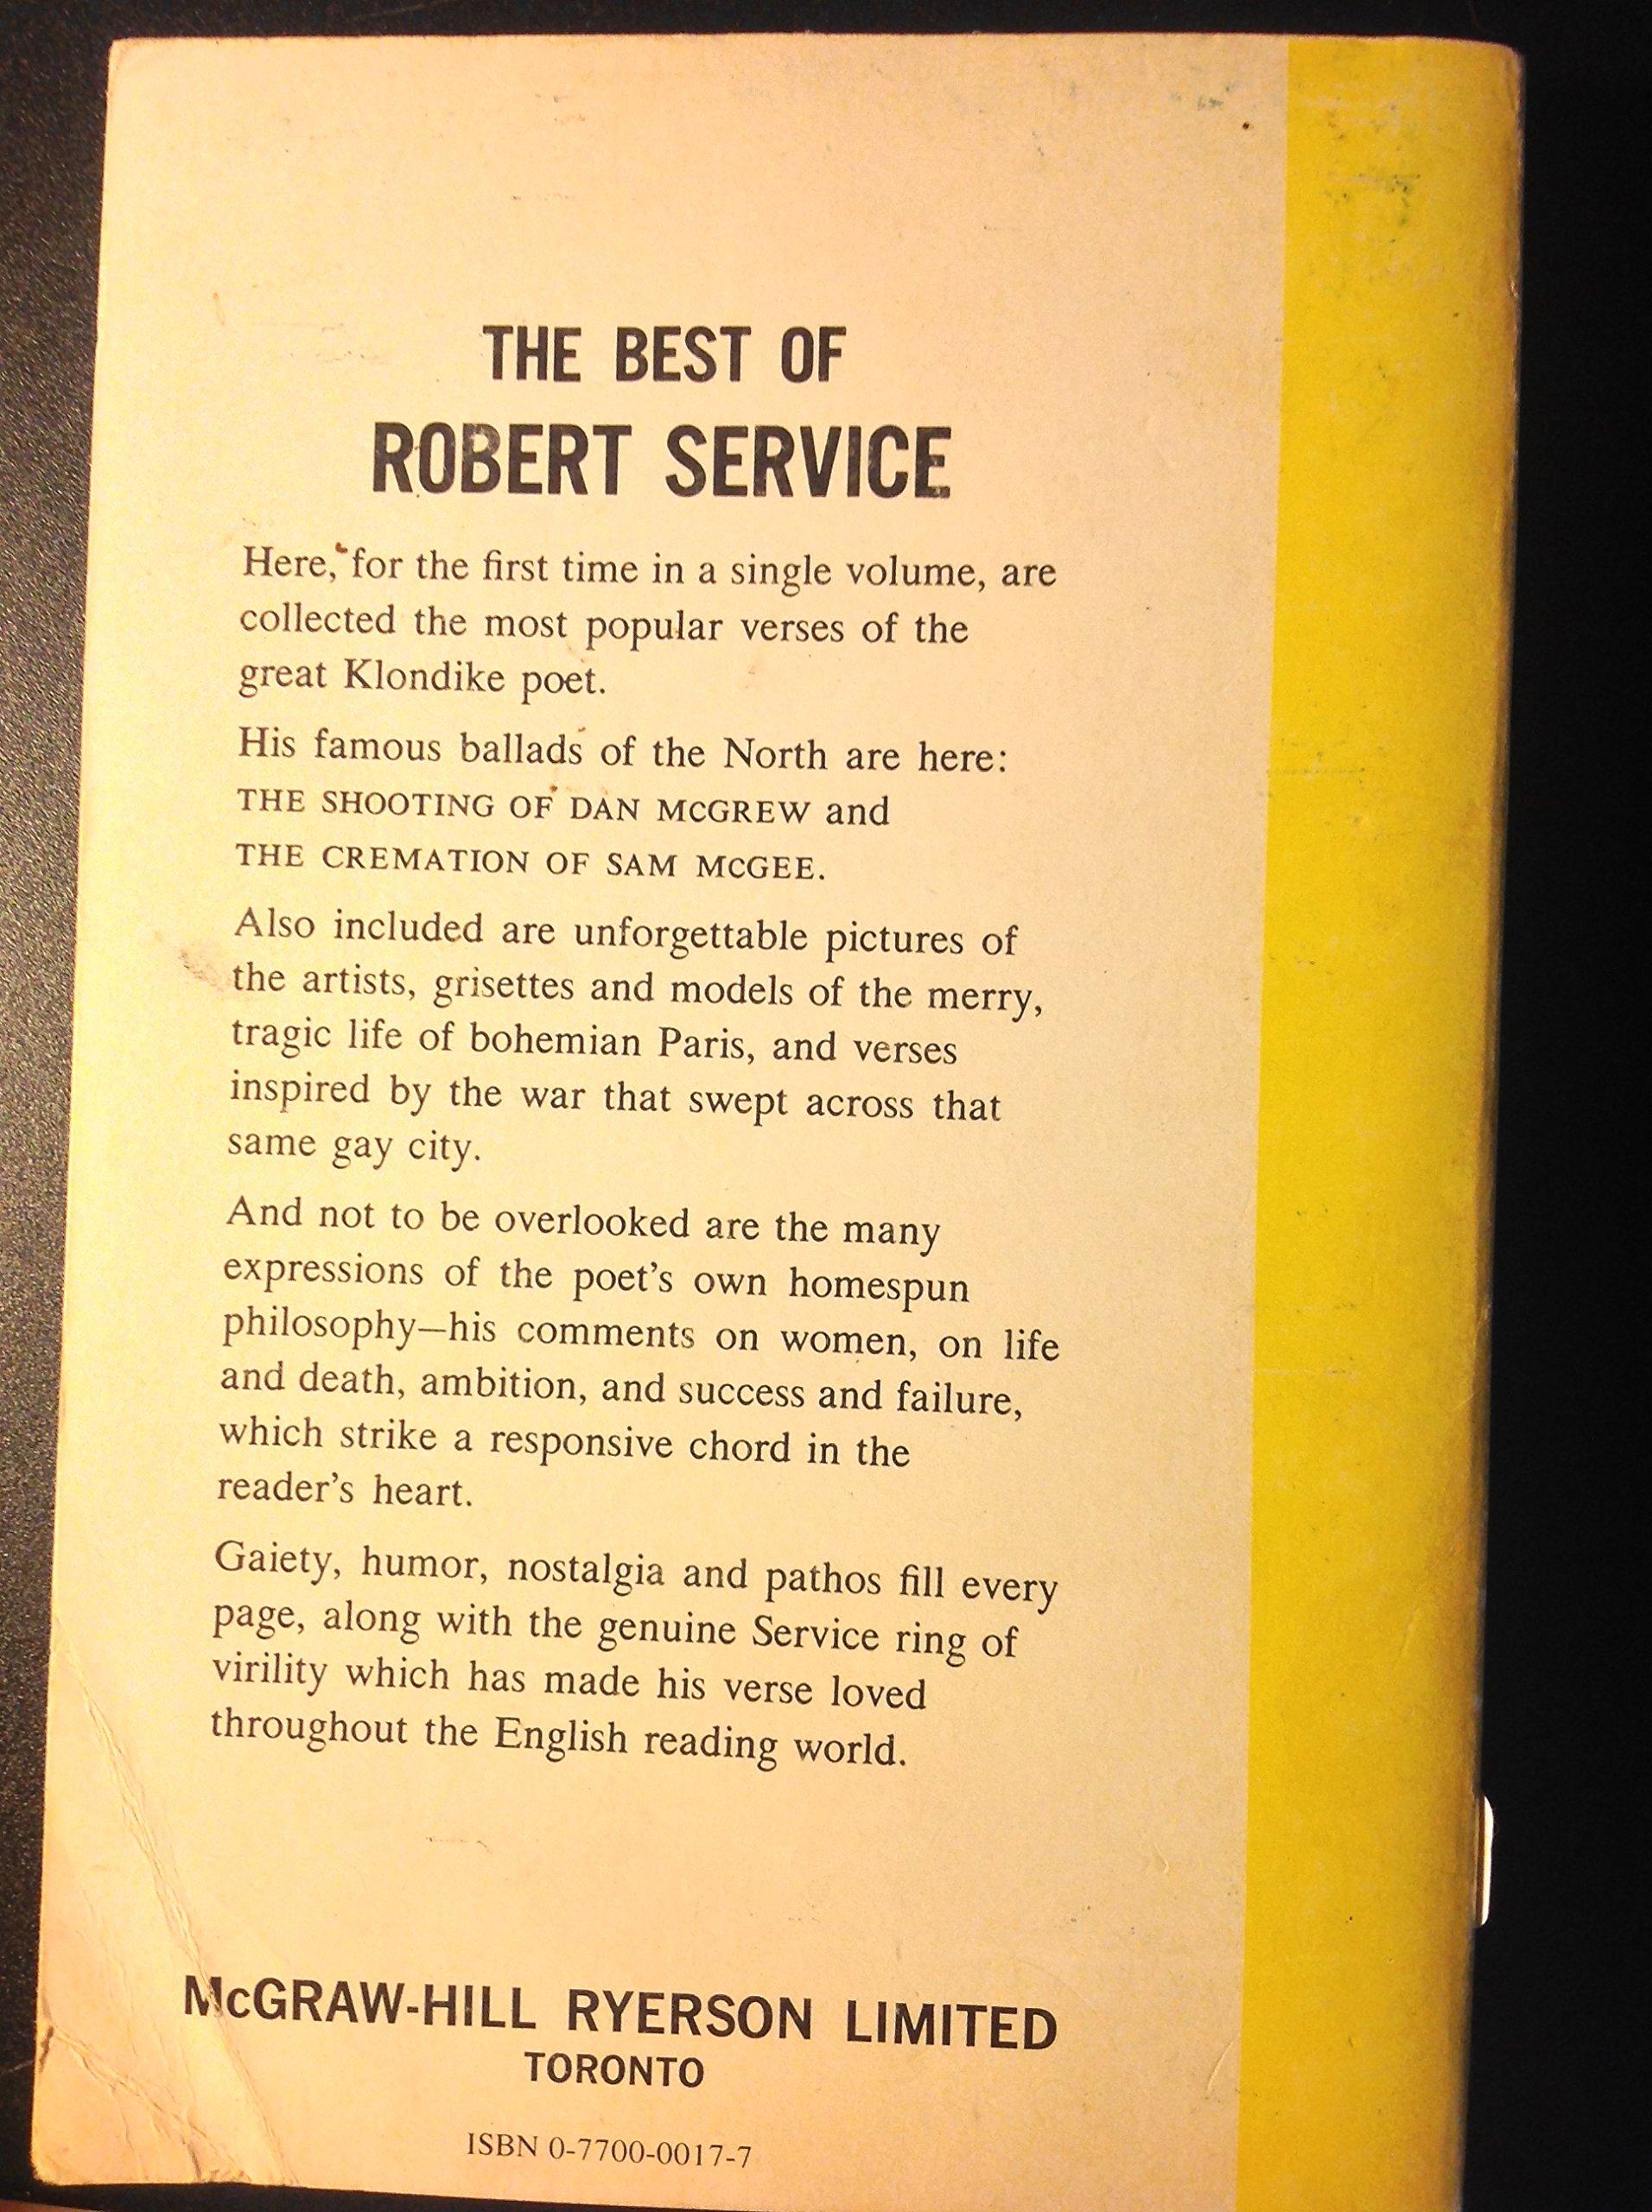 The Best Of Robert Service: Robert Service: 9780770000172: Amazon: Books